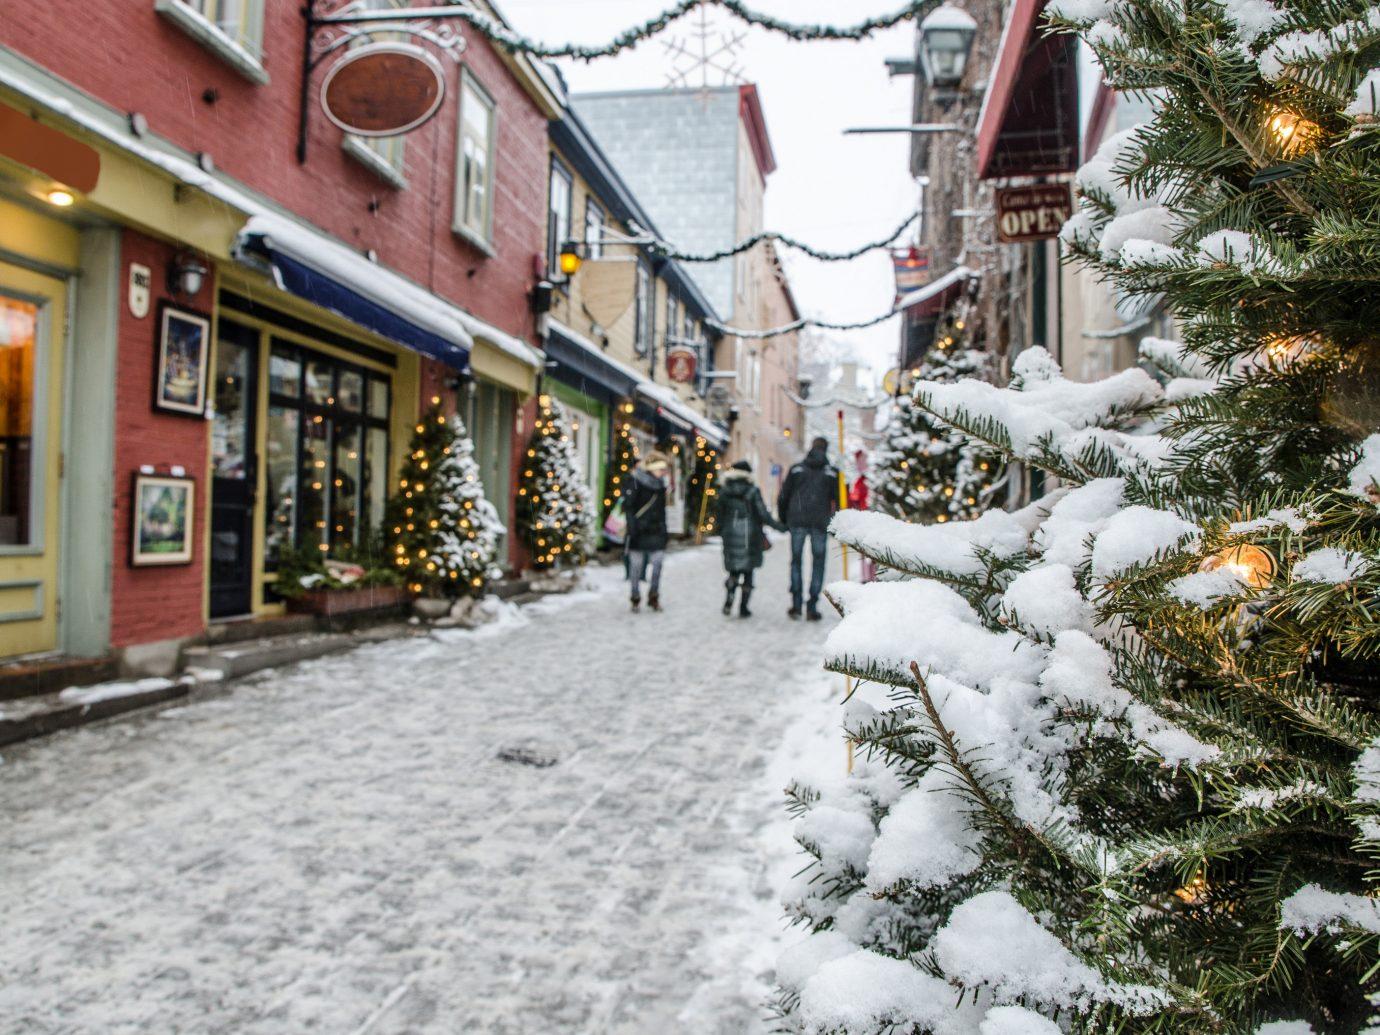 Boutique Hotels Romance Trip Ideas snow outdoor building weather Winter Town scene tree way neighbourhood season sidewalk